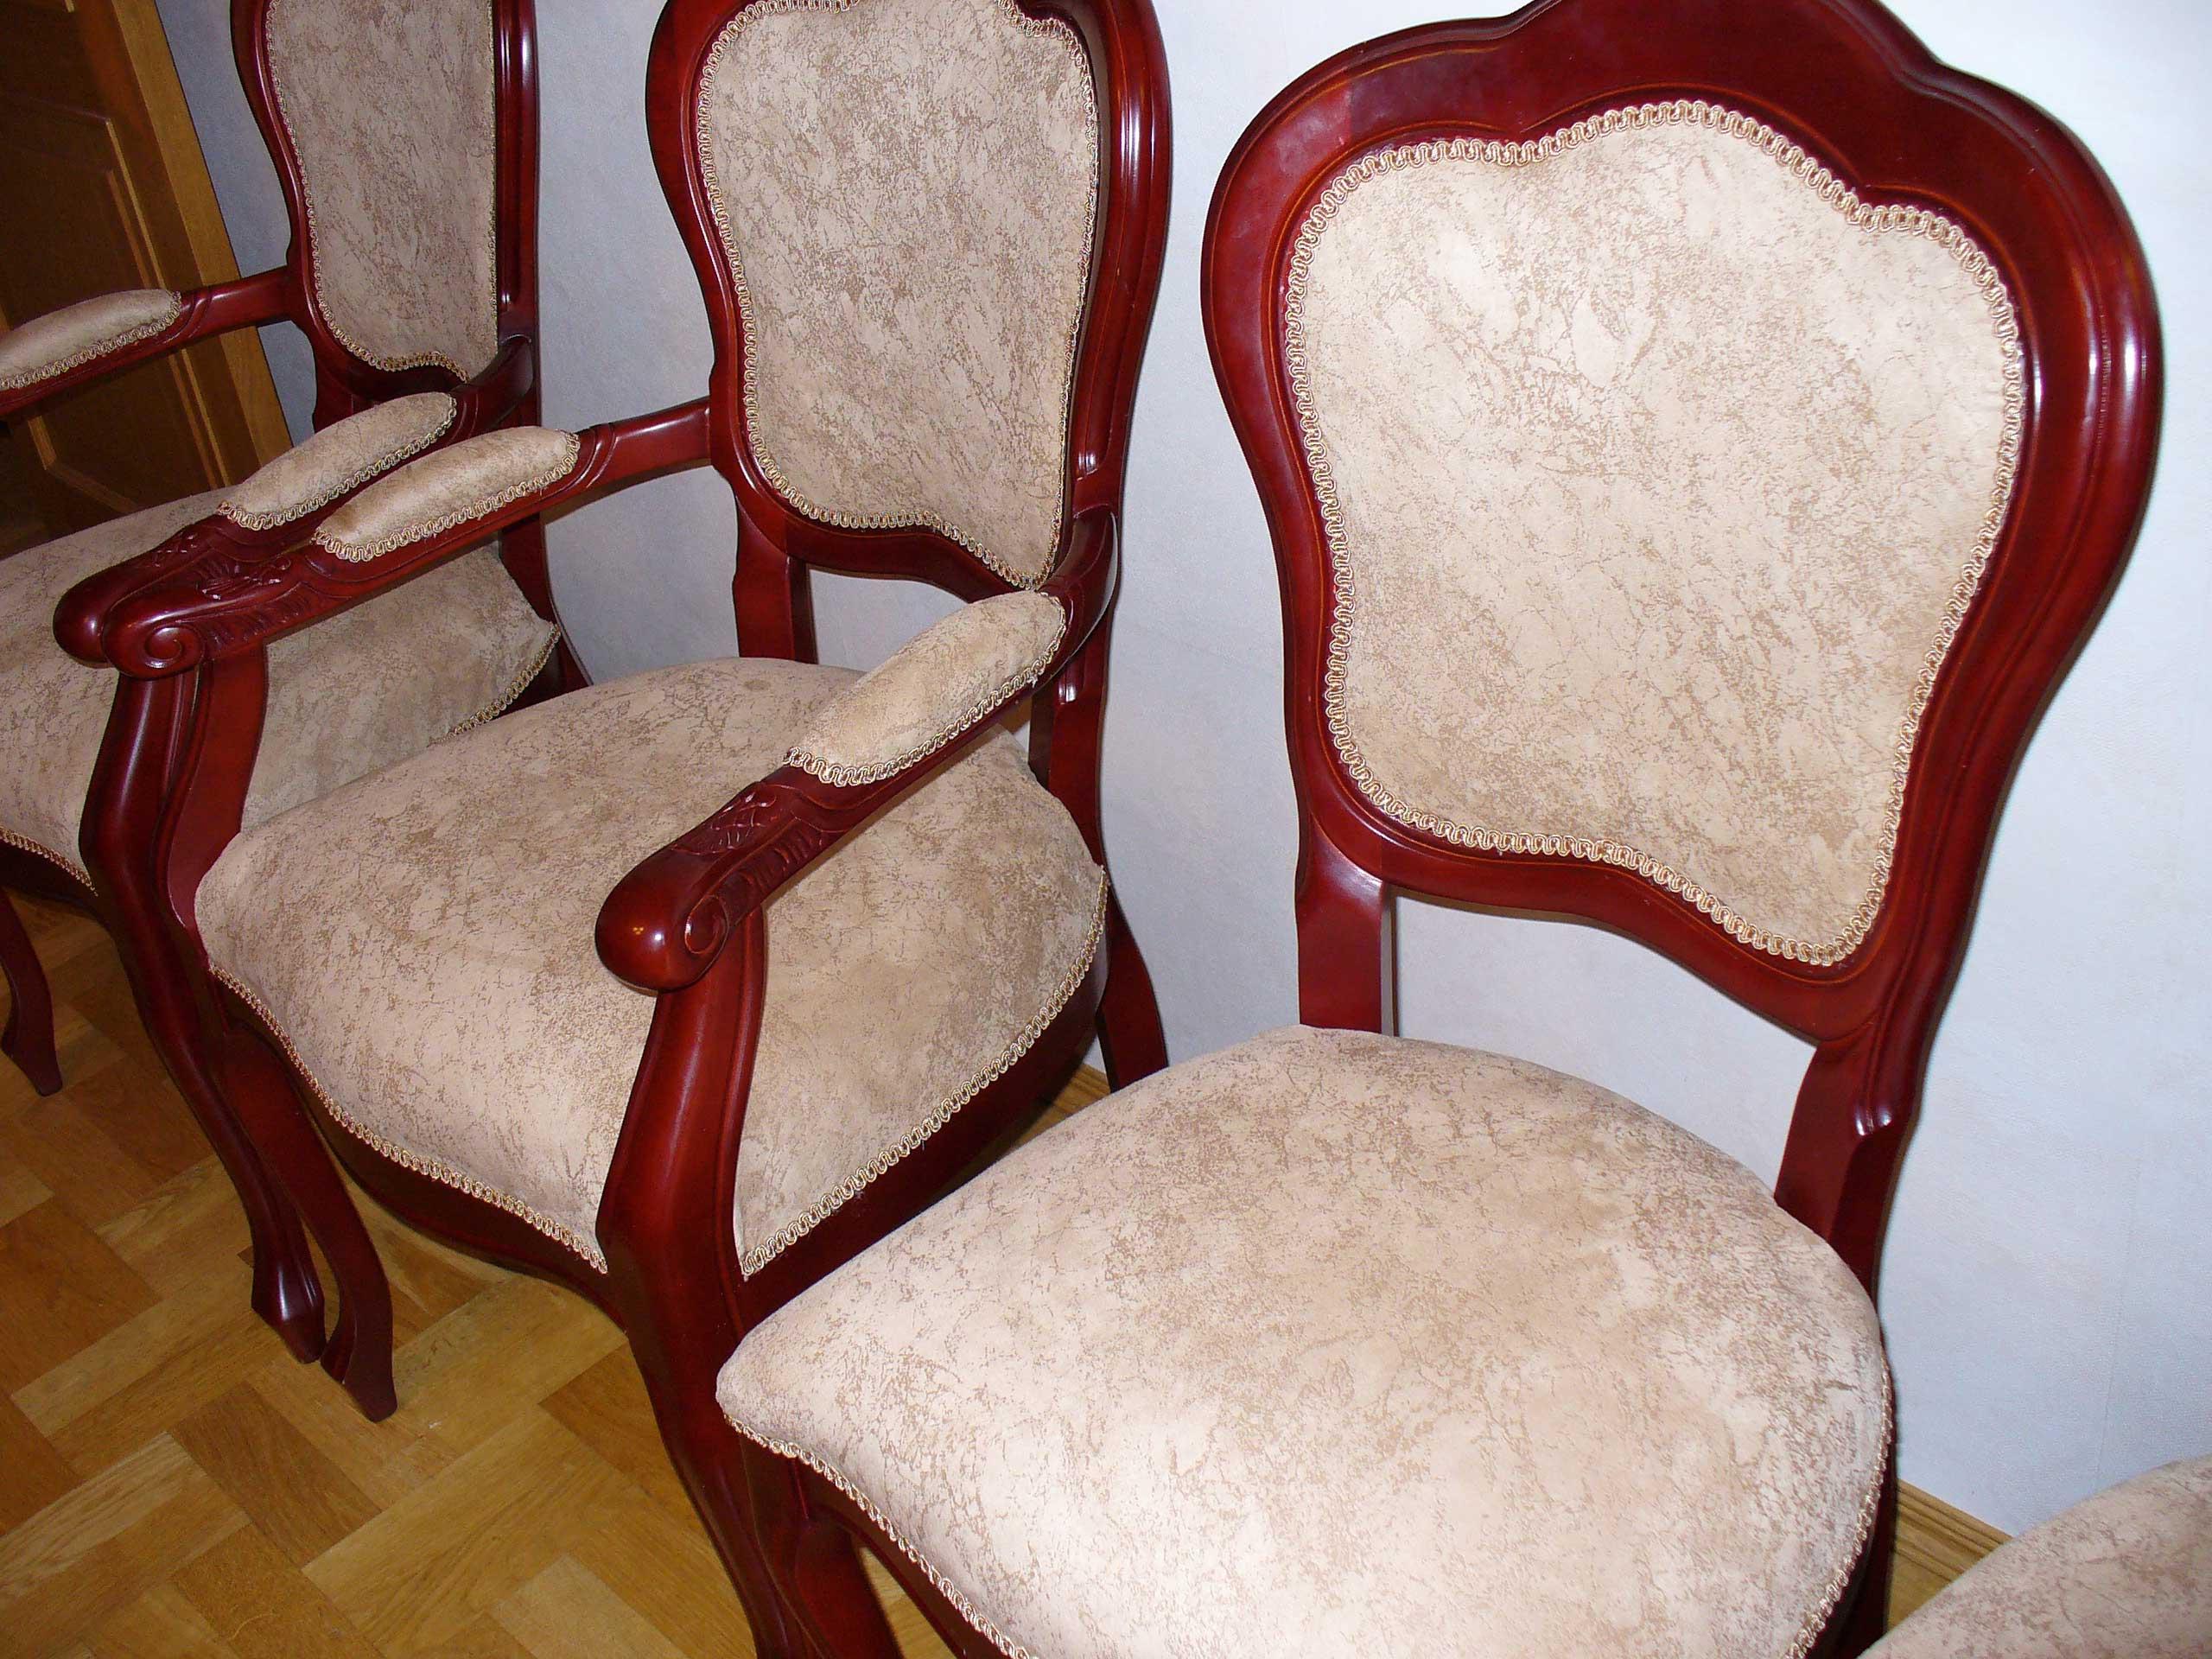 Как перетянуть стул своими руками: перетяжка обивки на стуле